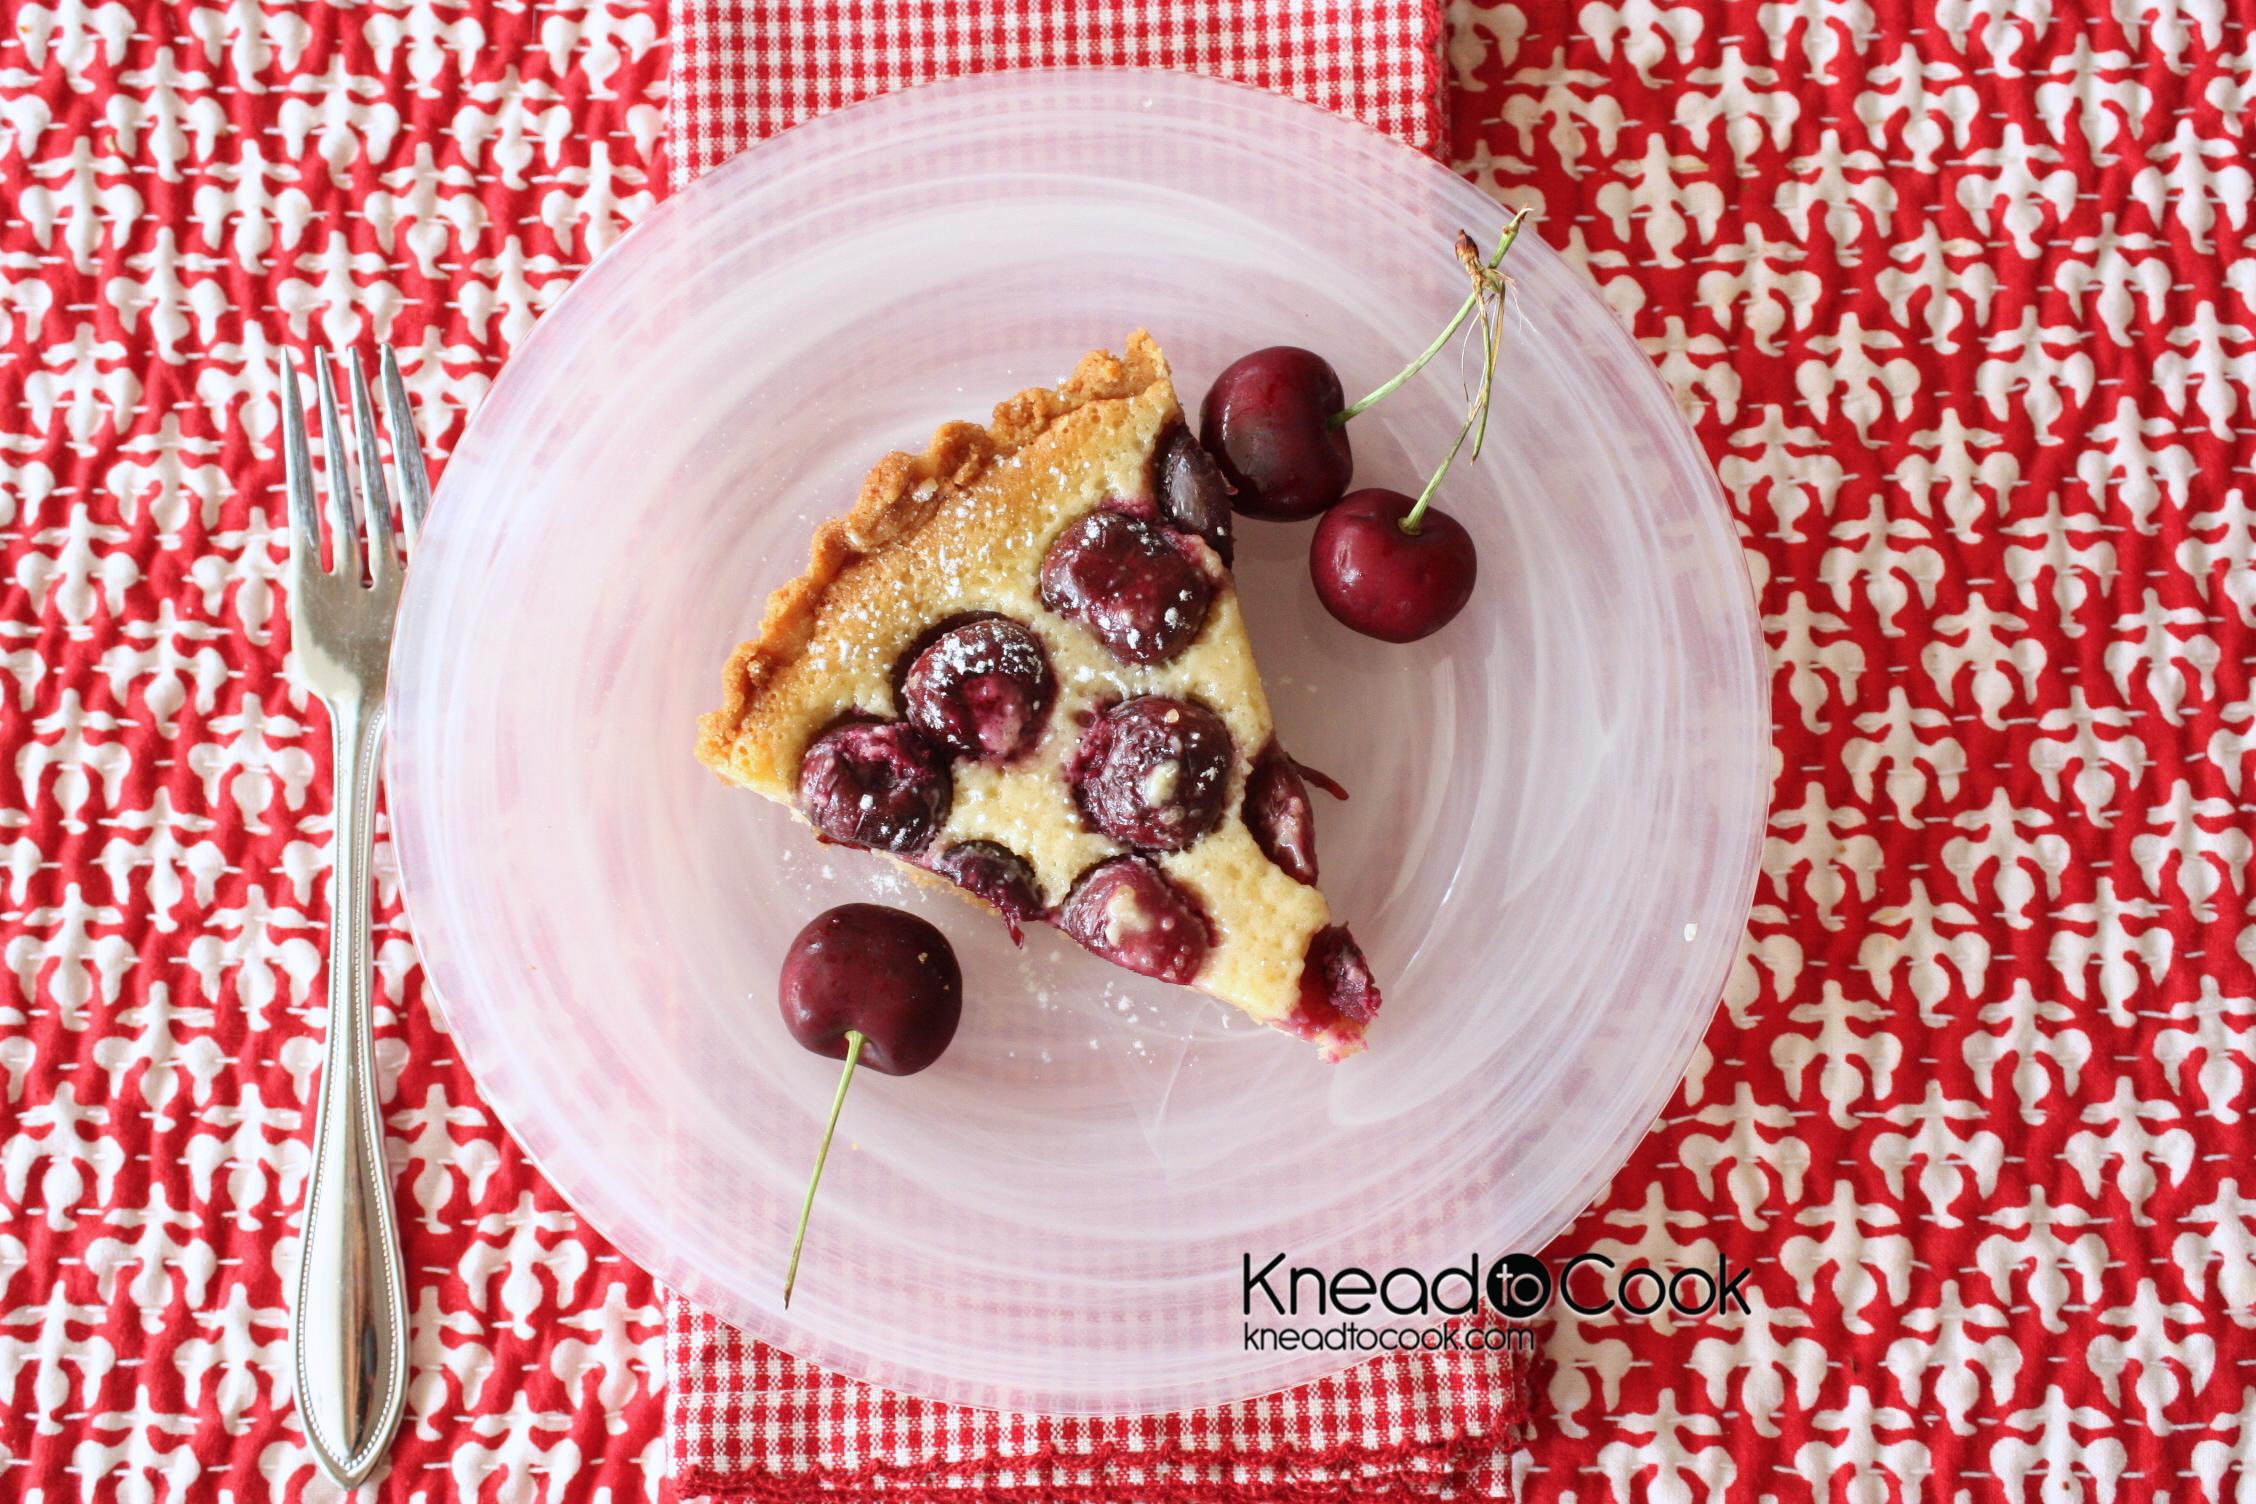 ... cherry amaretto tart cherry amaretto clafouti tart with almond praline